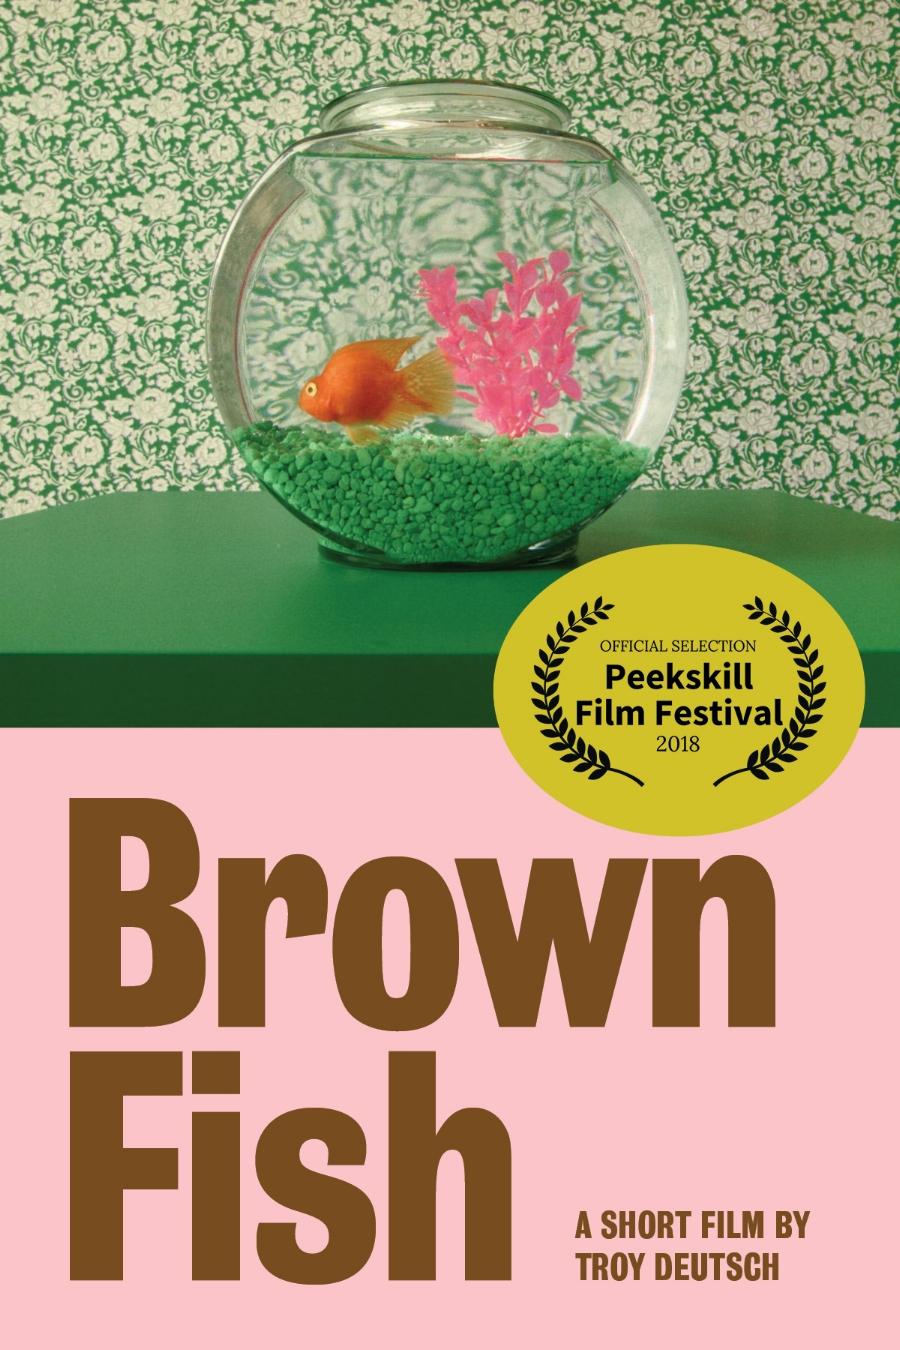 BF.Poster.Peekskill.Laurels.jpg